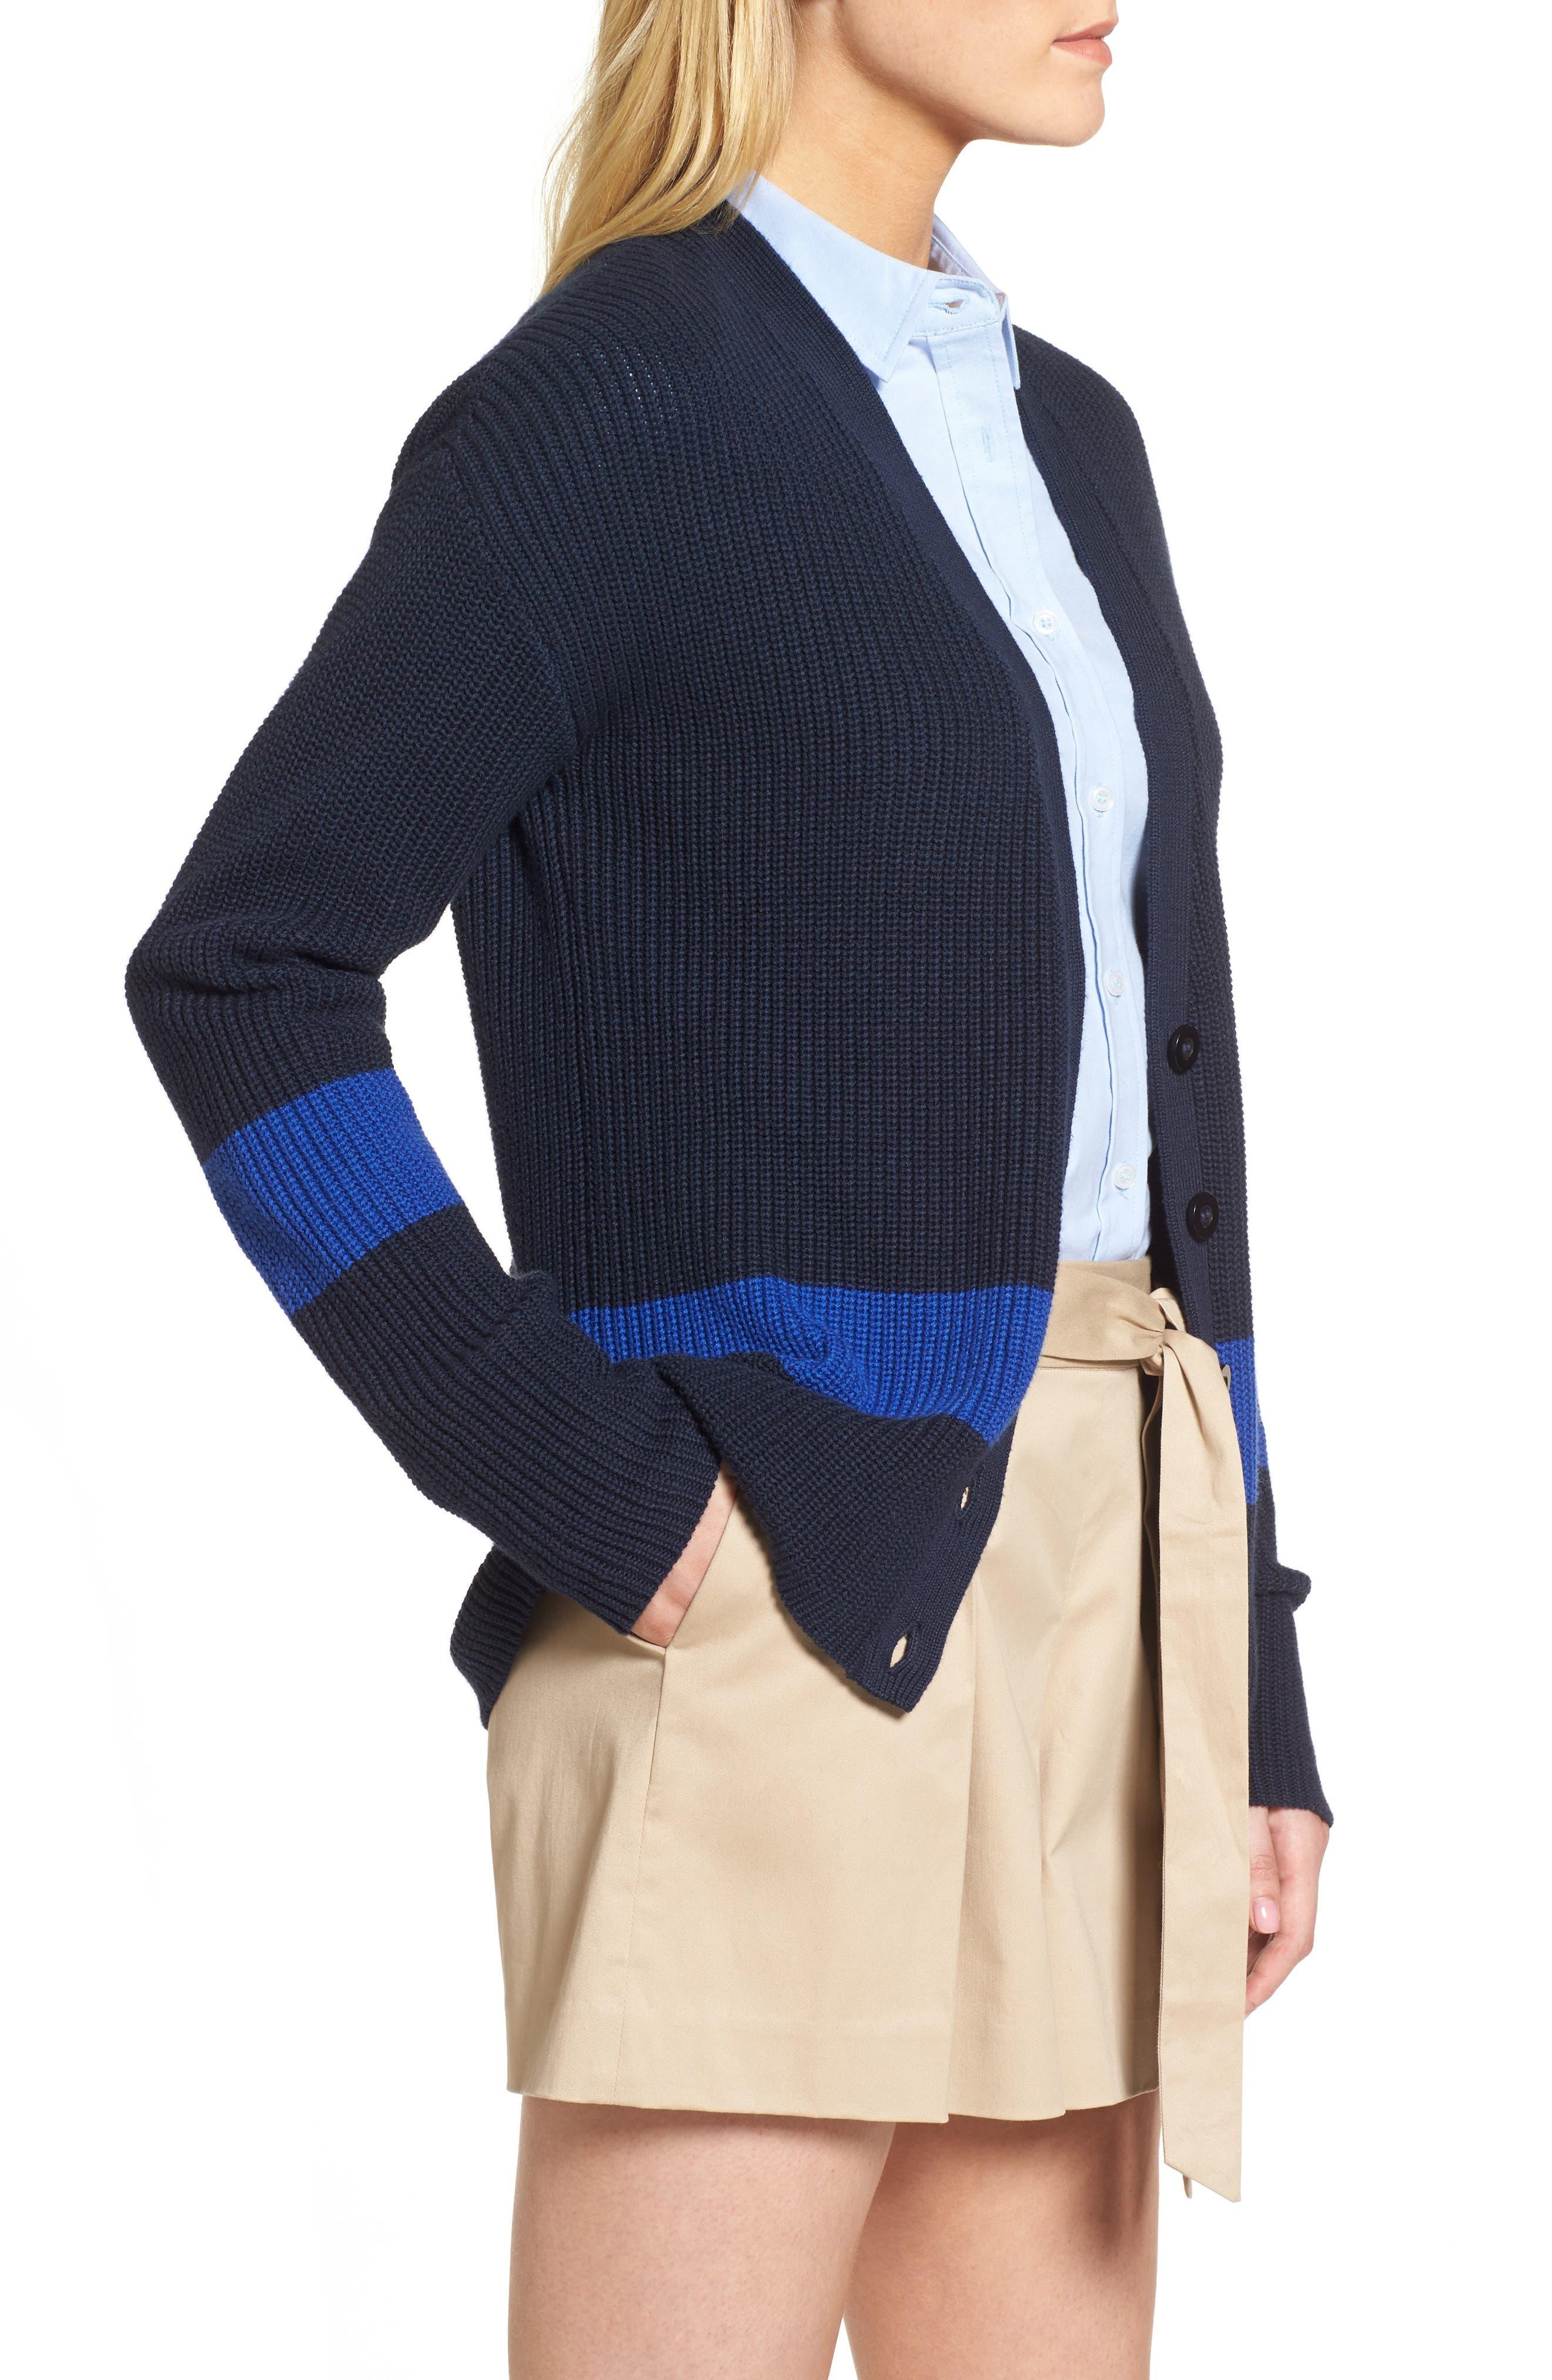 Shaker Knit Cardigan,                             Alternate thumbnail 3, color,                             Navy- Blue Colorblock